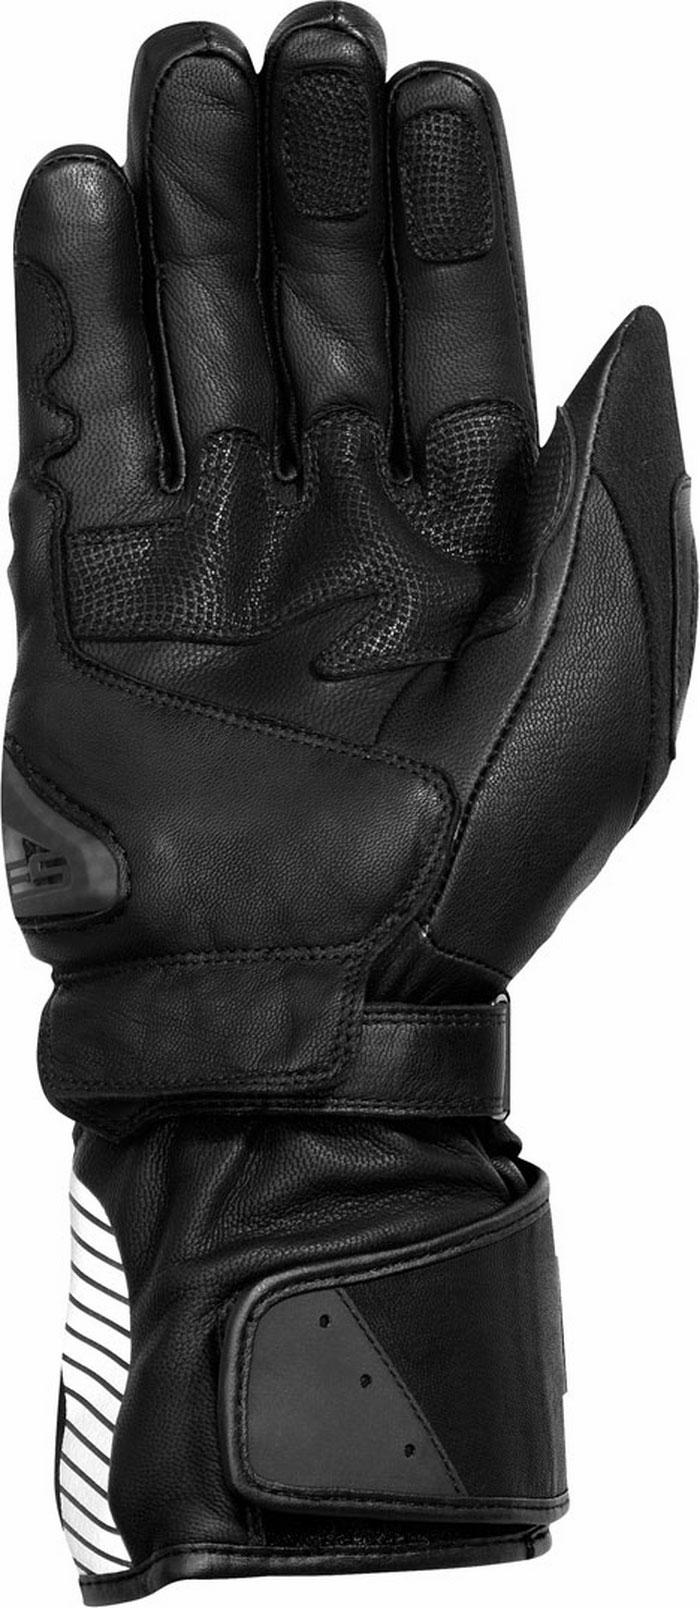 REV'IT! Bastion GTX Winter Gloves